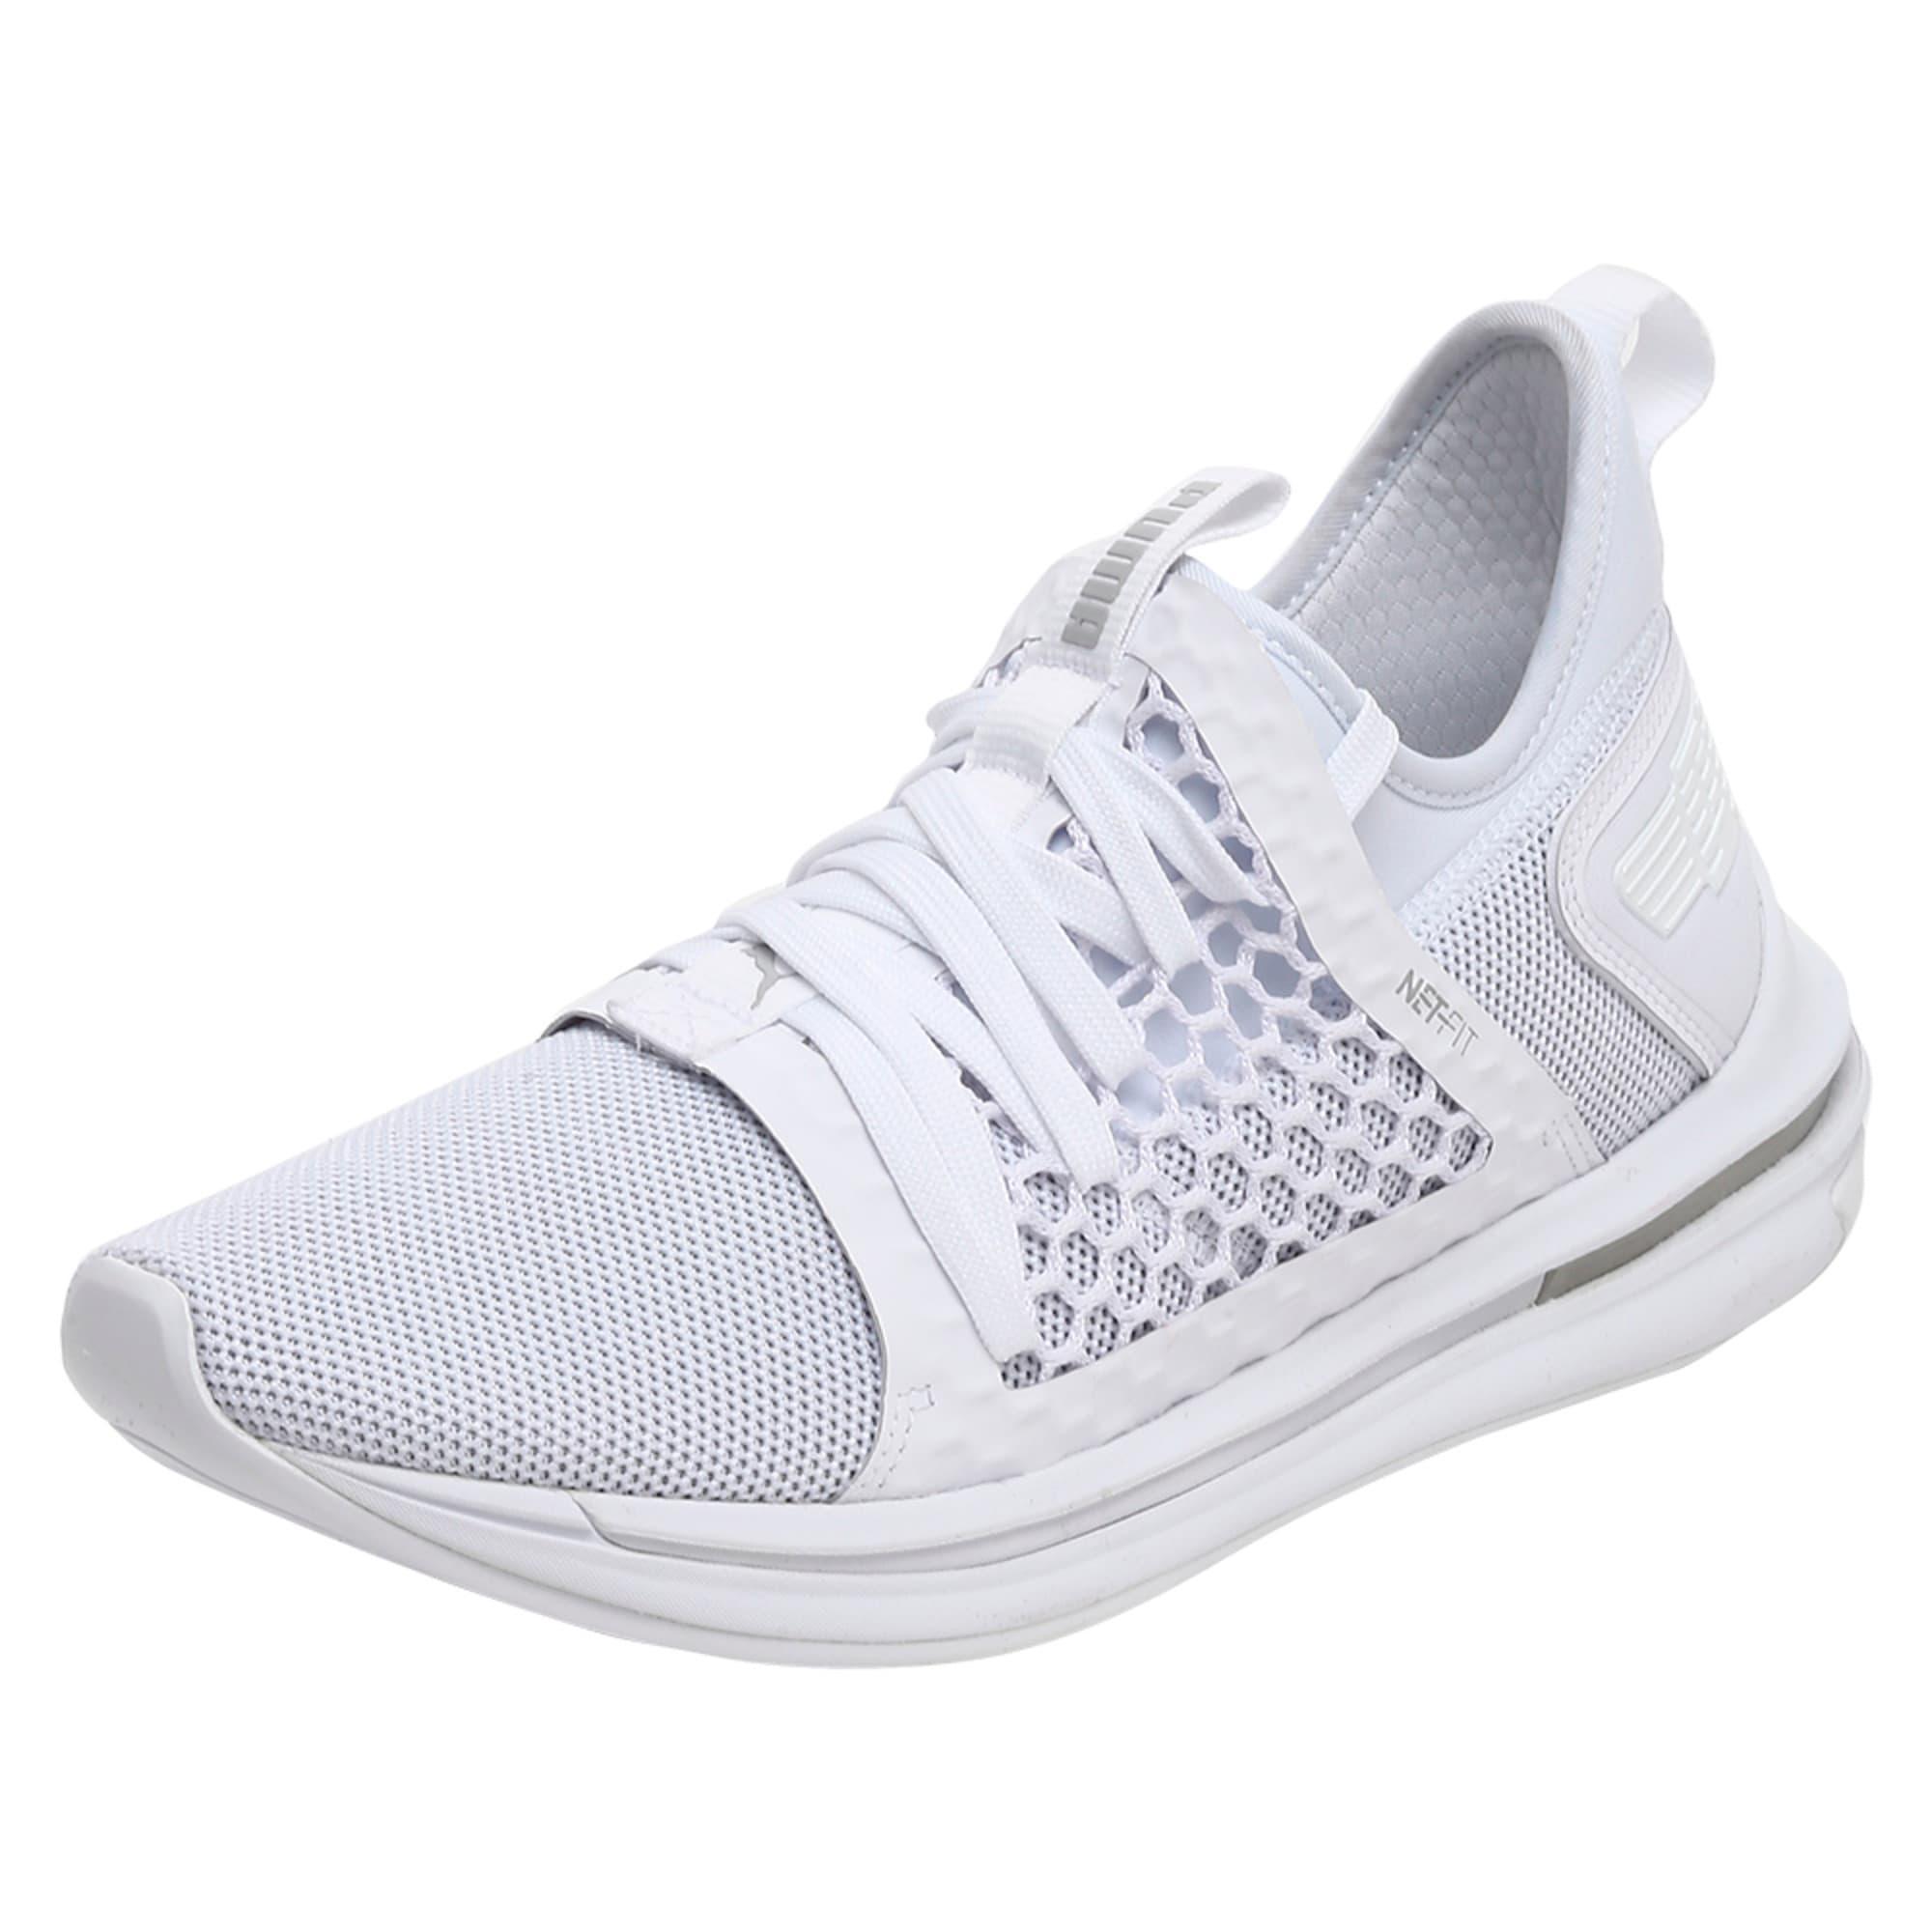 Thumbnail 5 of IGNITE Limitless SR NETFIT Men's Trainer Shoes, Puma White-Puma White, medium-IND